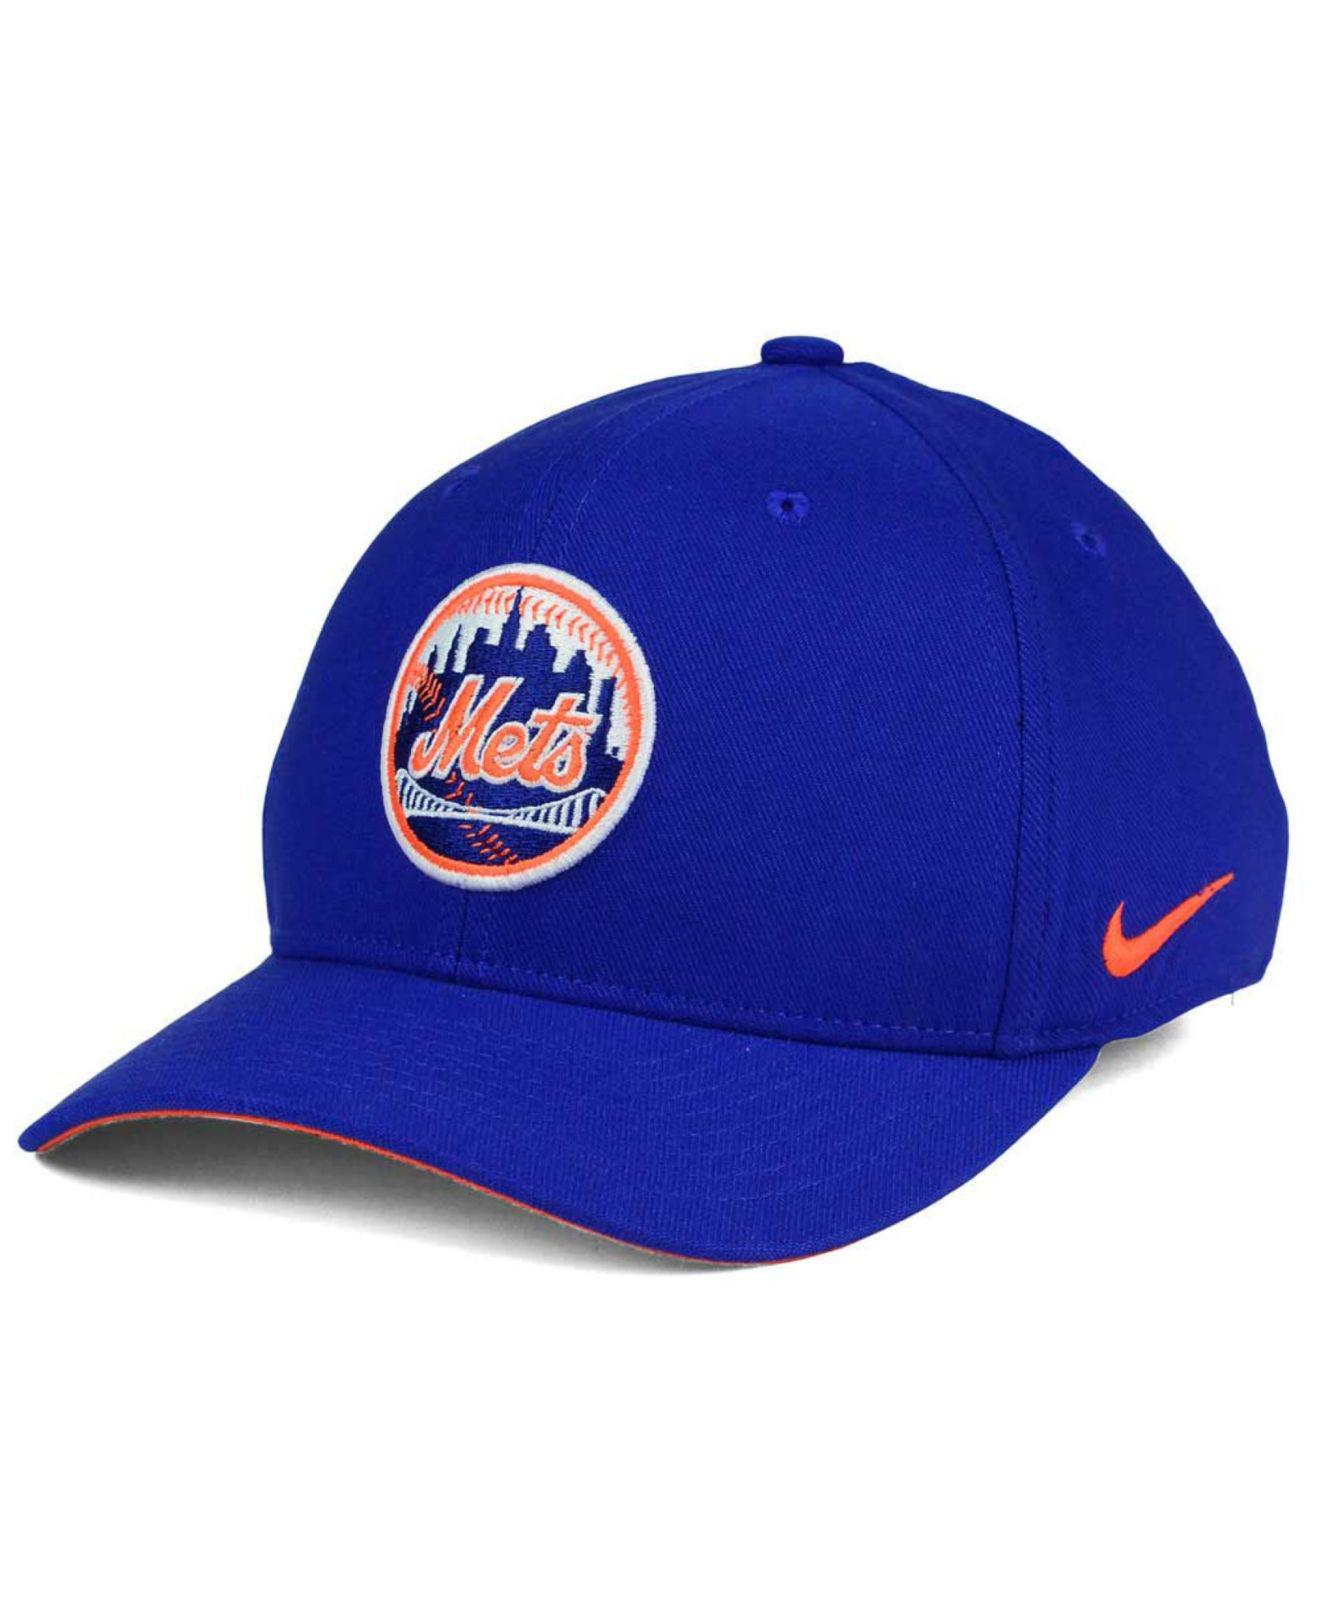 Lyst - Nike New York Mets Ligature Swoosh Flex Cap in Blue for Men 31d55711ec05